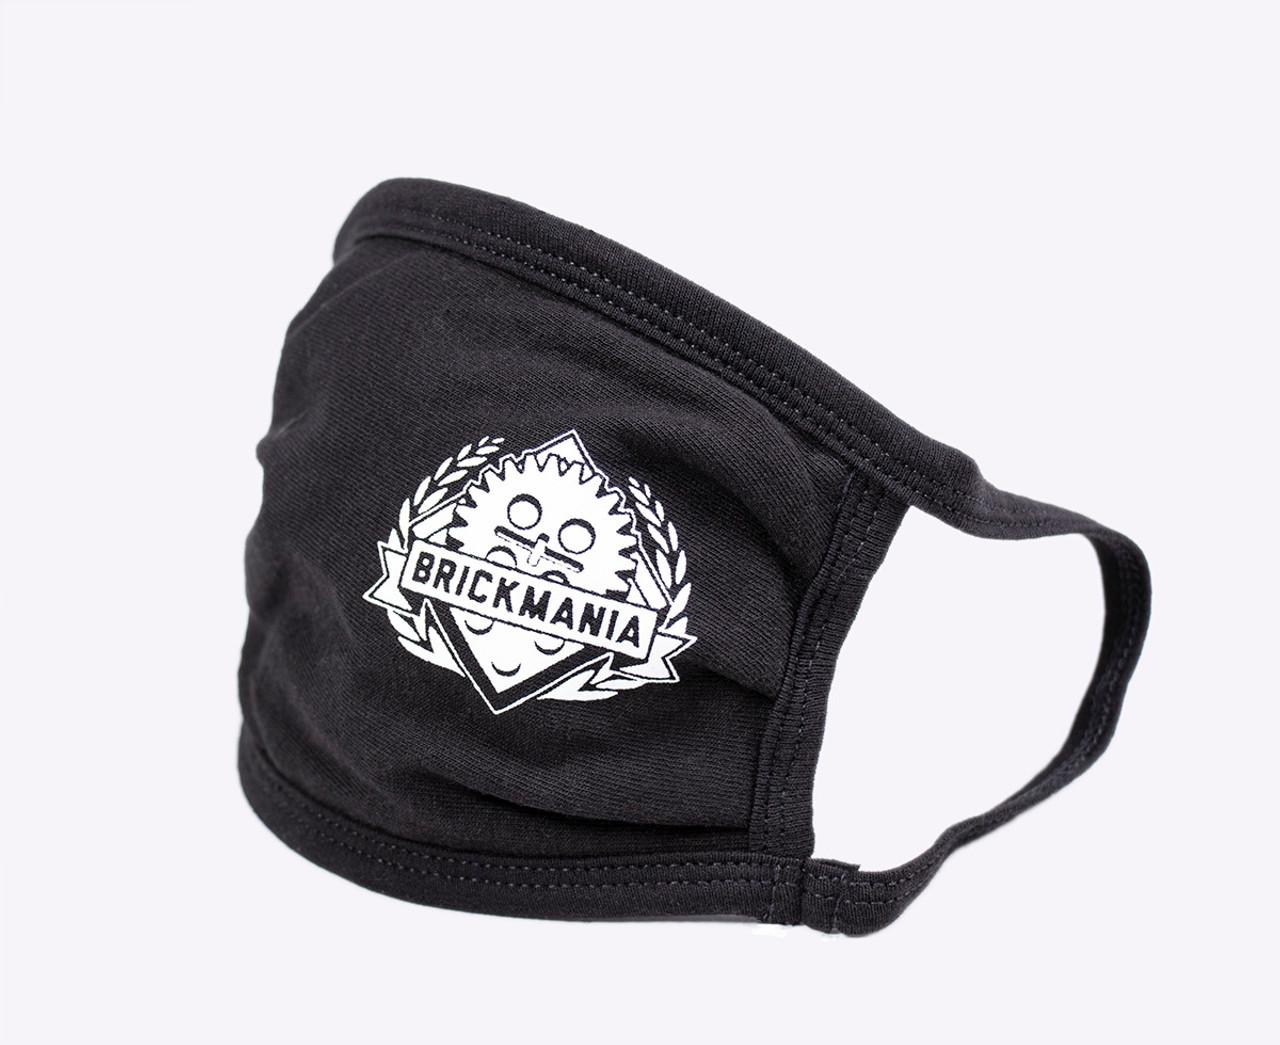 Brickmania Face Mask - White Logo